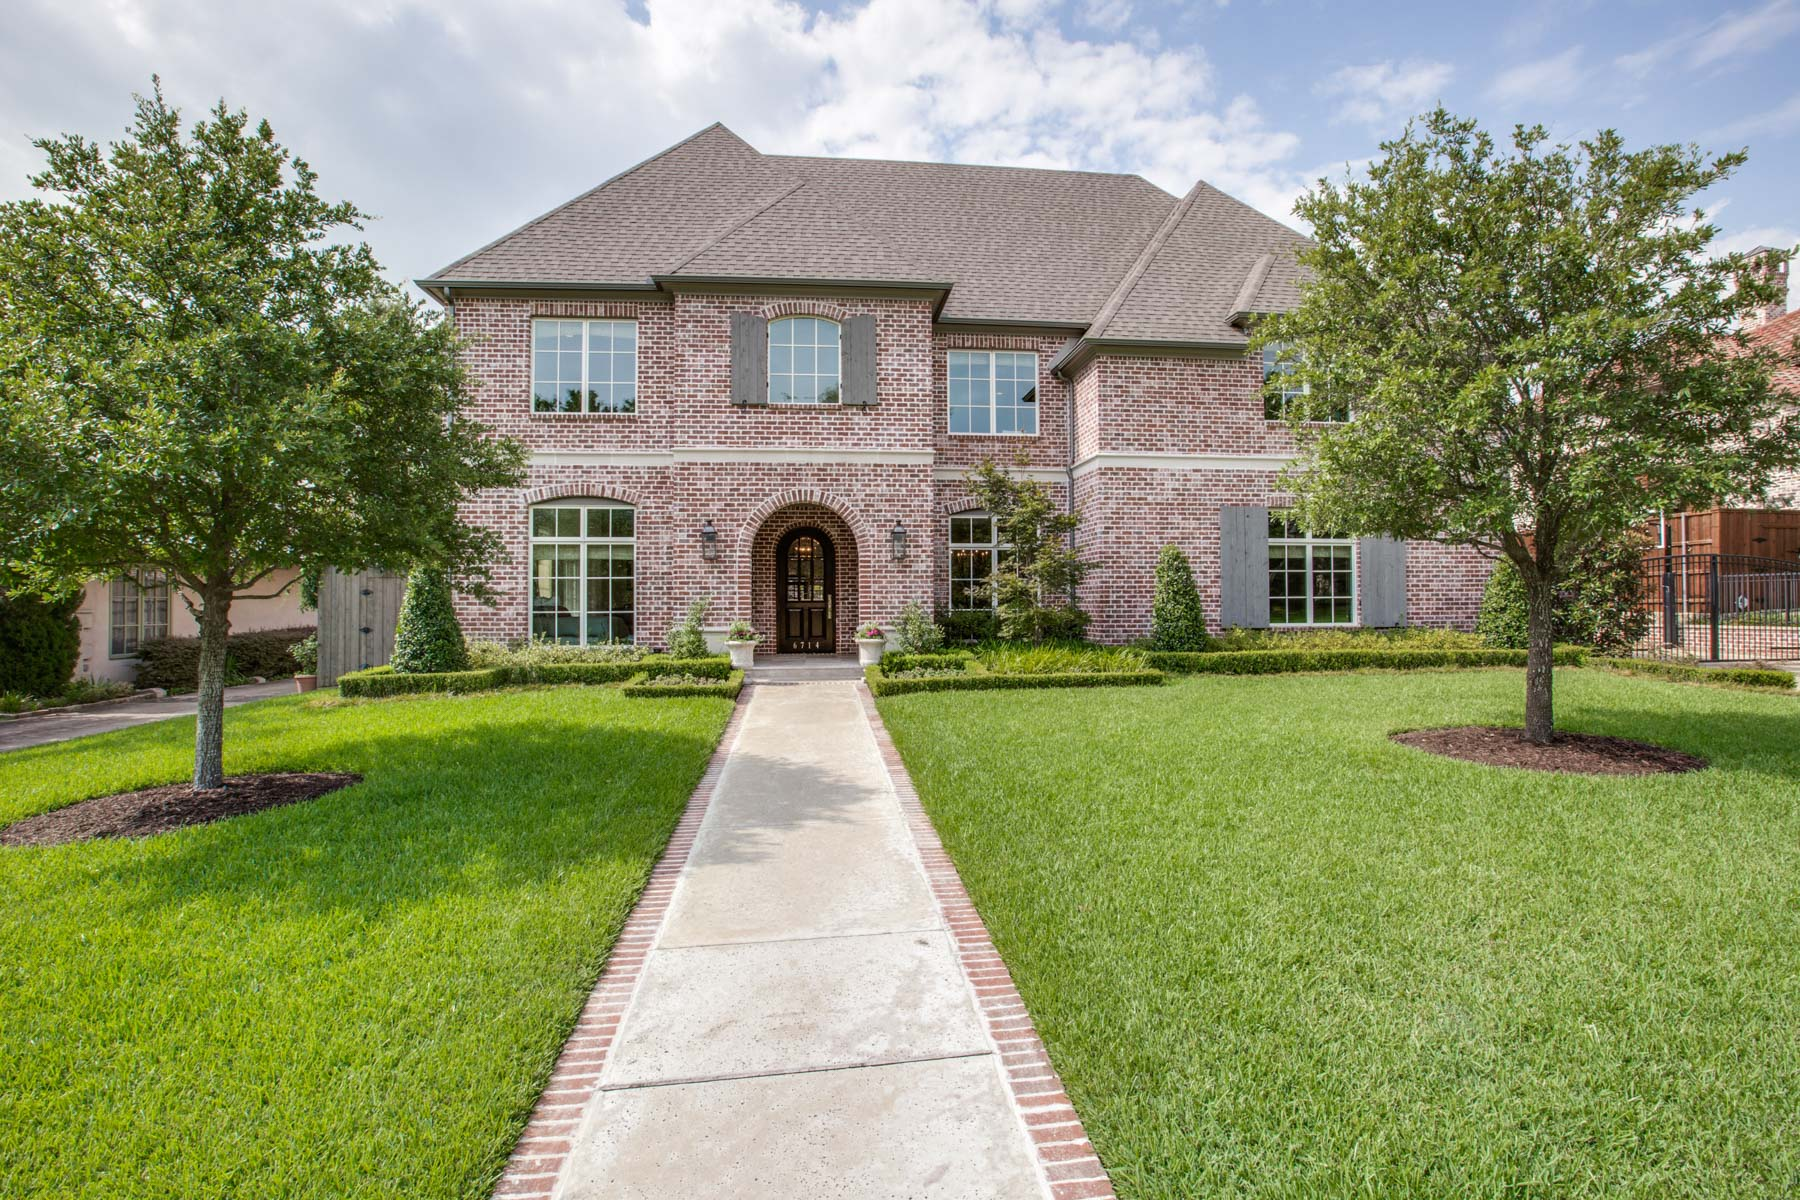 独户住宅 为 销售 在 Preston Hollow Transitional 6714 Northport Drive 达拉斯, 得克萨斯州, 75230 美国